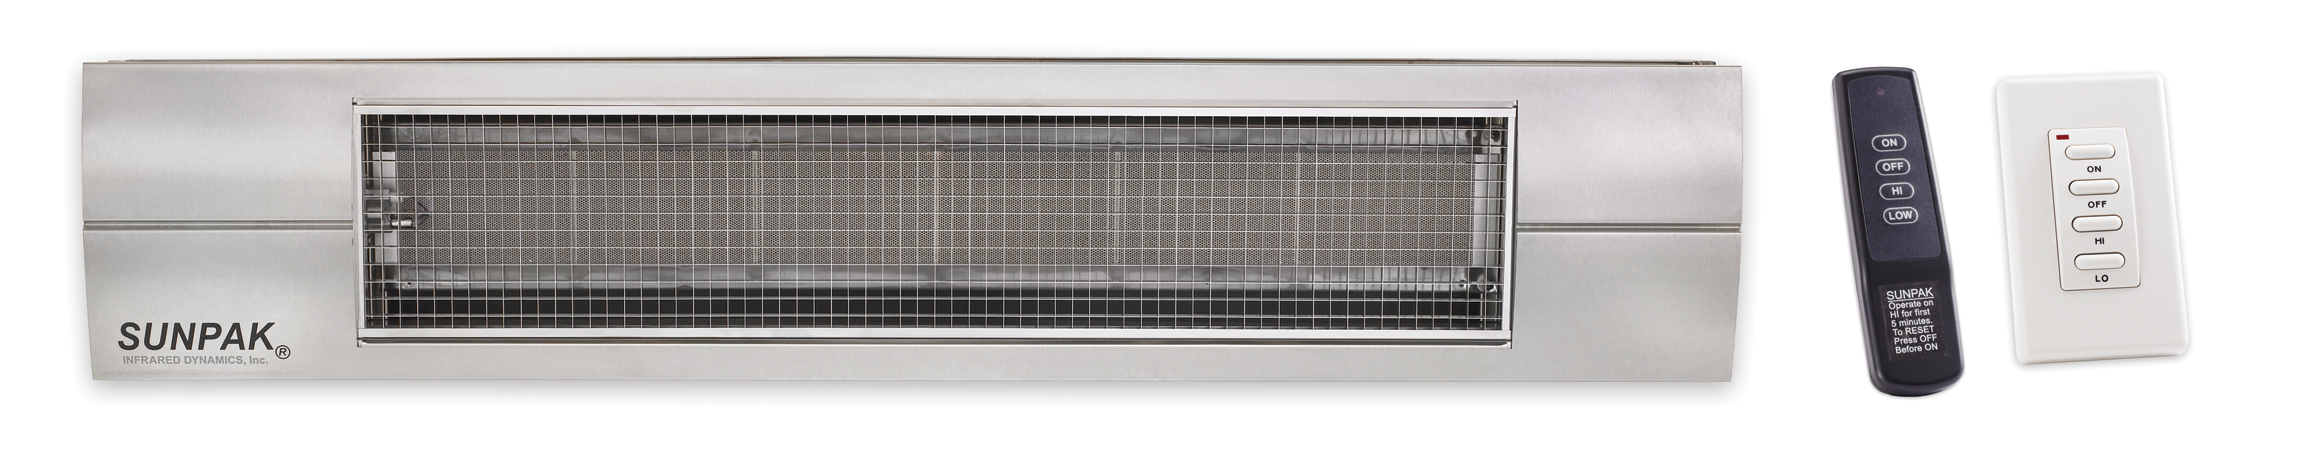 Sunpak Tsr Two Stage Gas Patio Heater